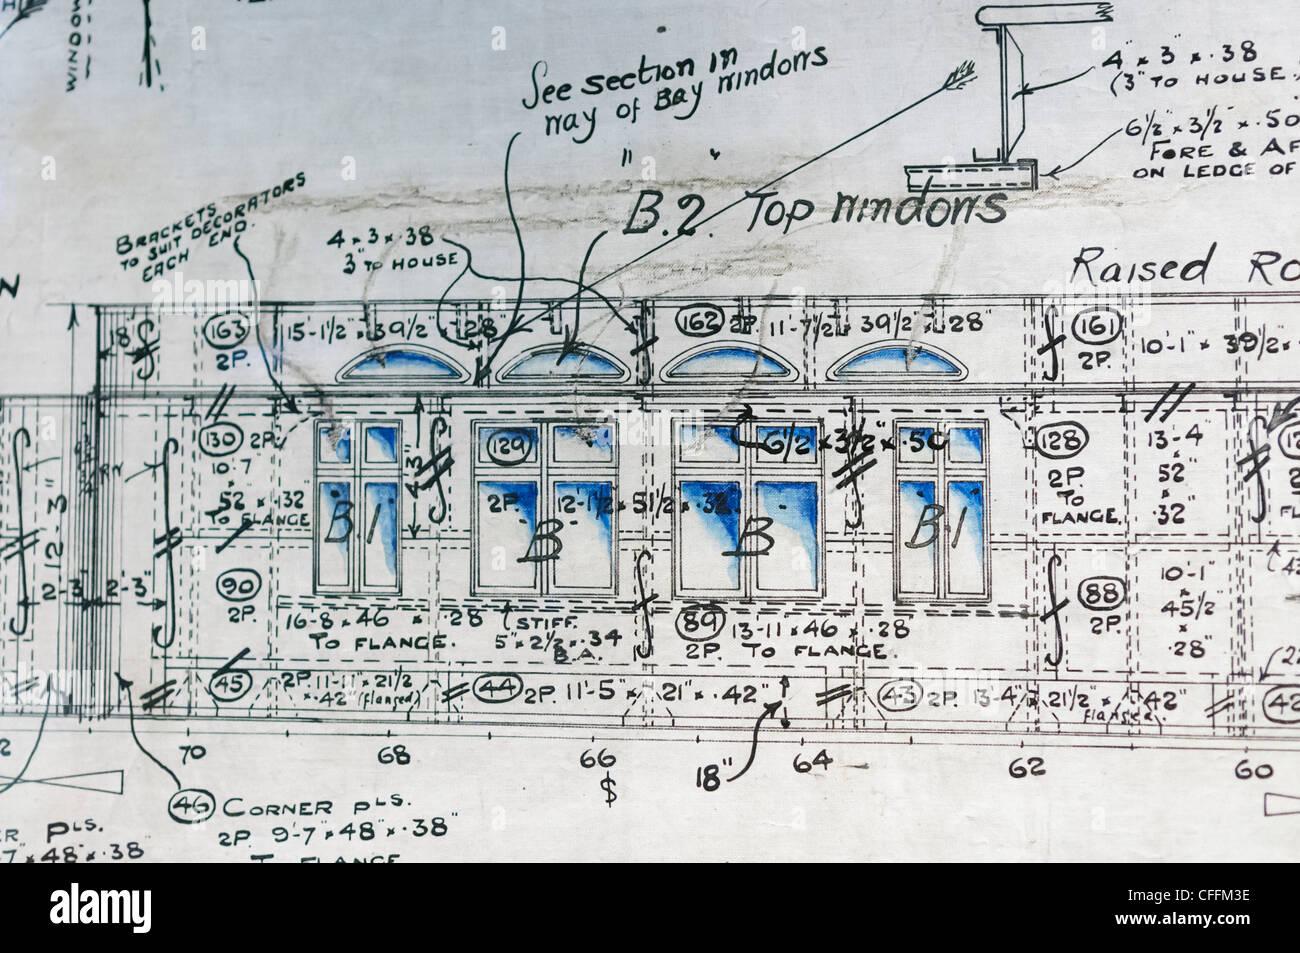 Titanic Floor Plan Original Engineering Drawing Plans Of The Promenade Deck